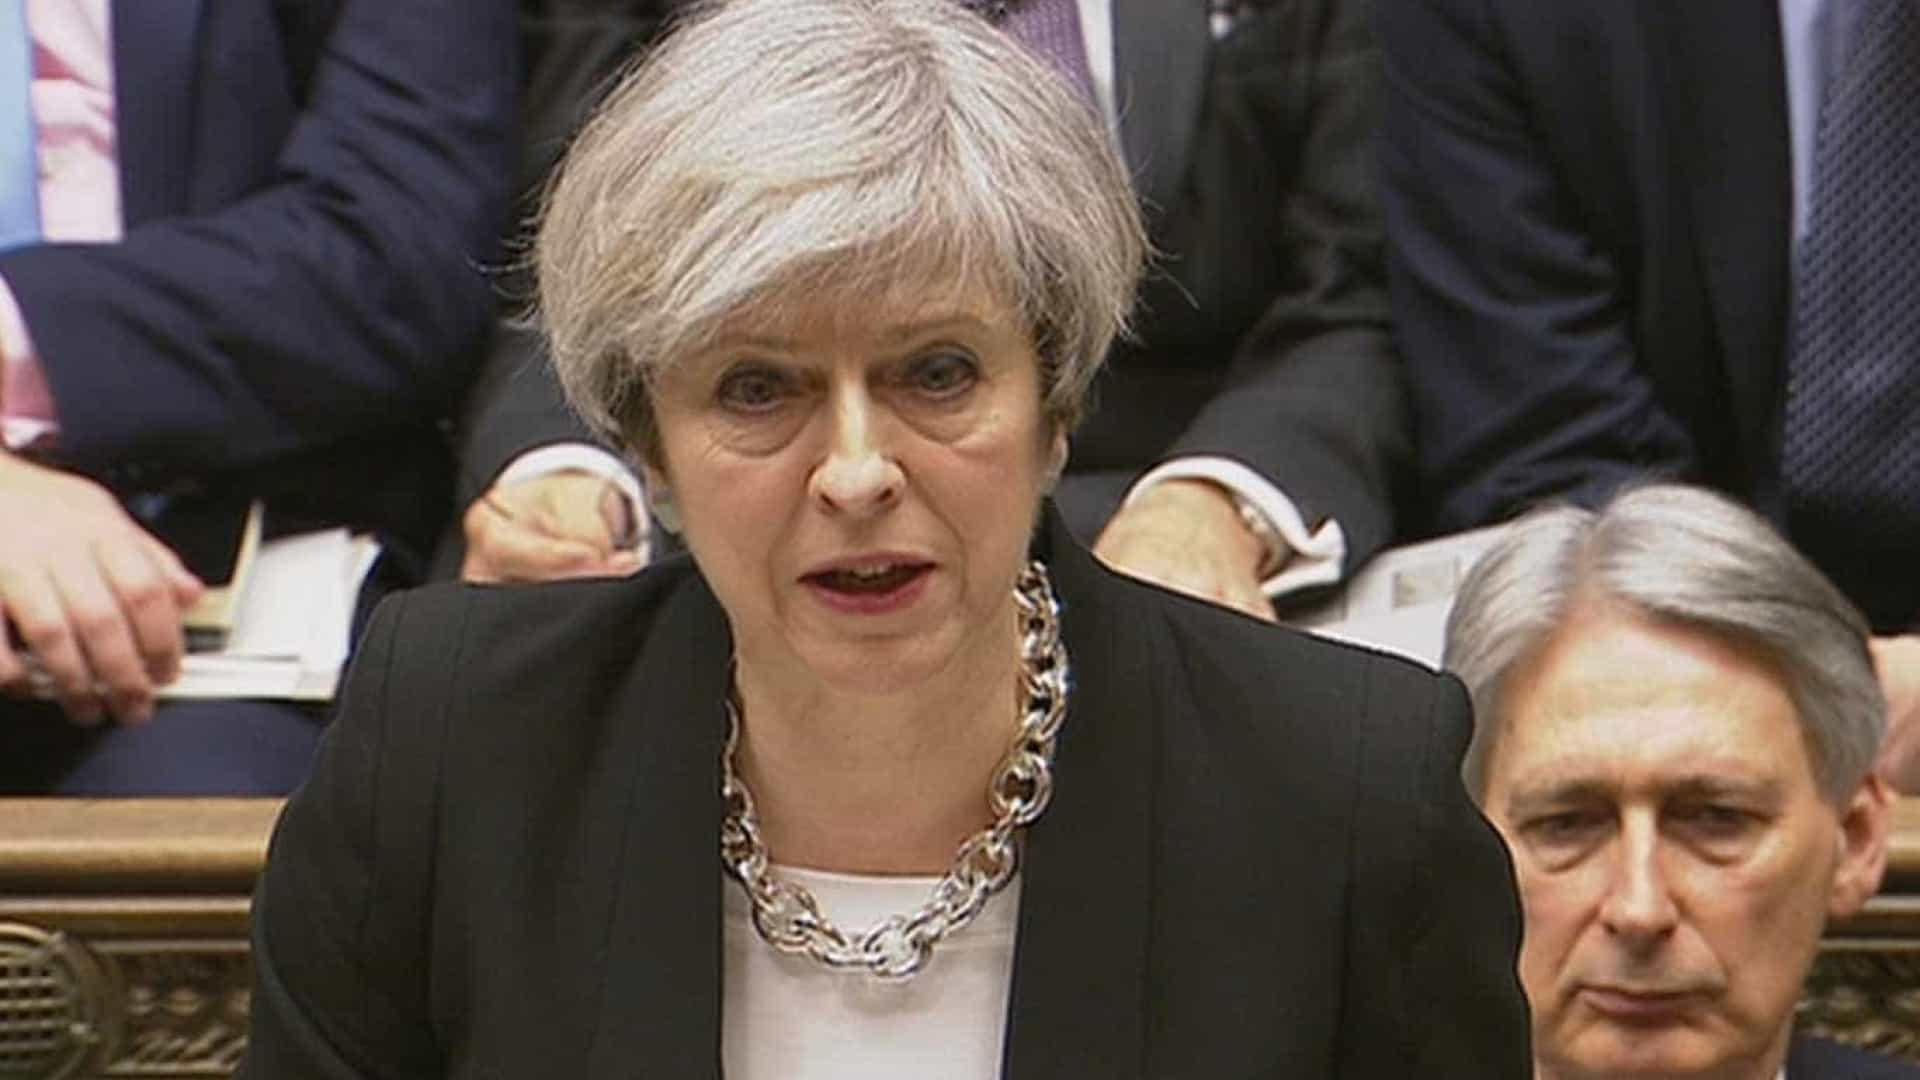 Theresa May expressa condolências a Hollande após atentado